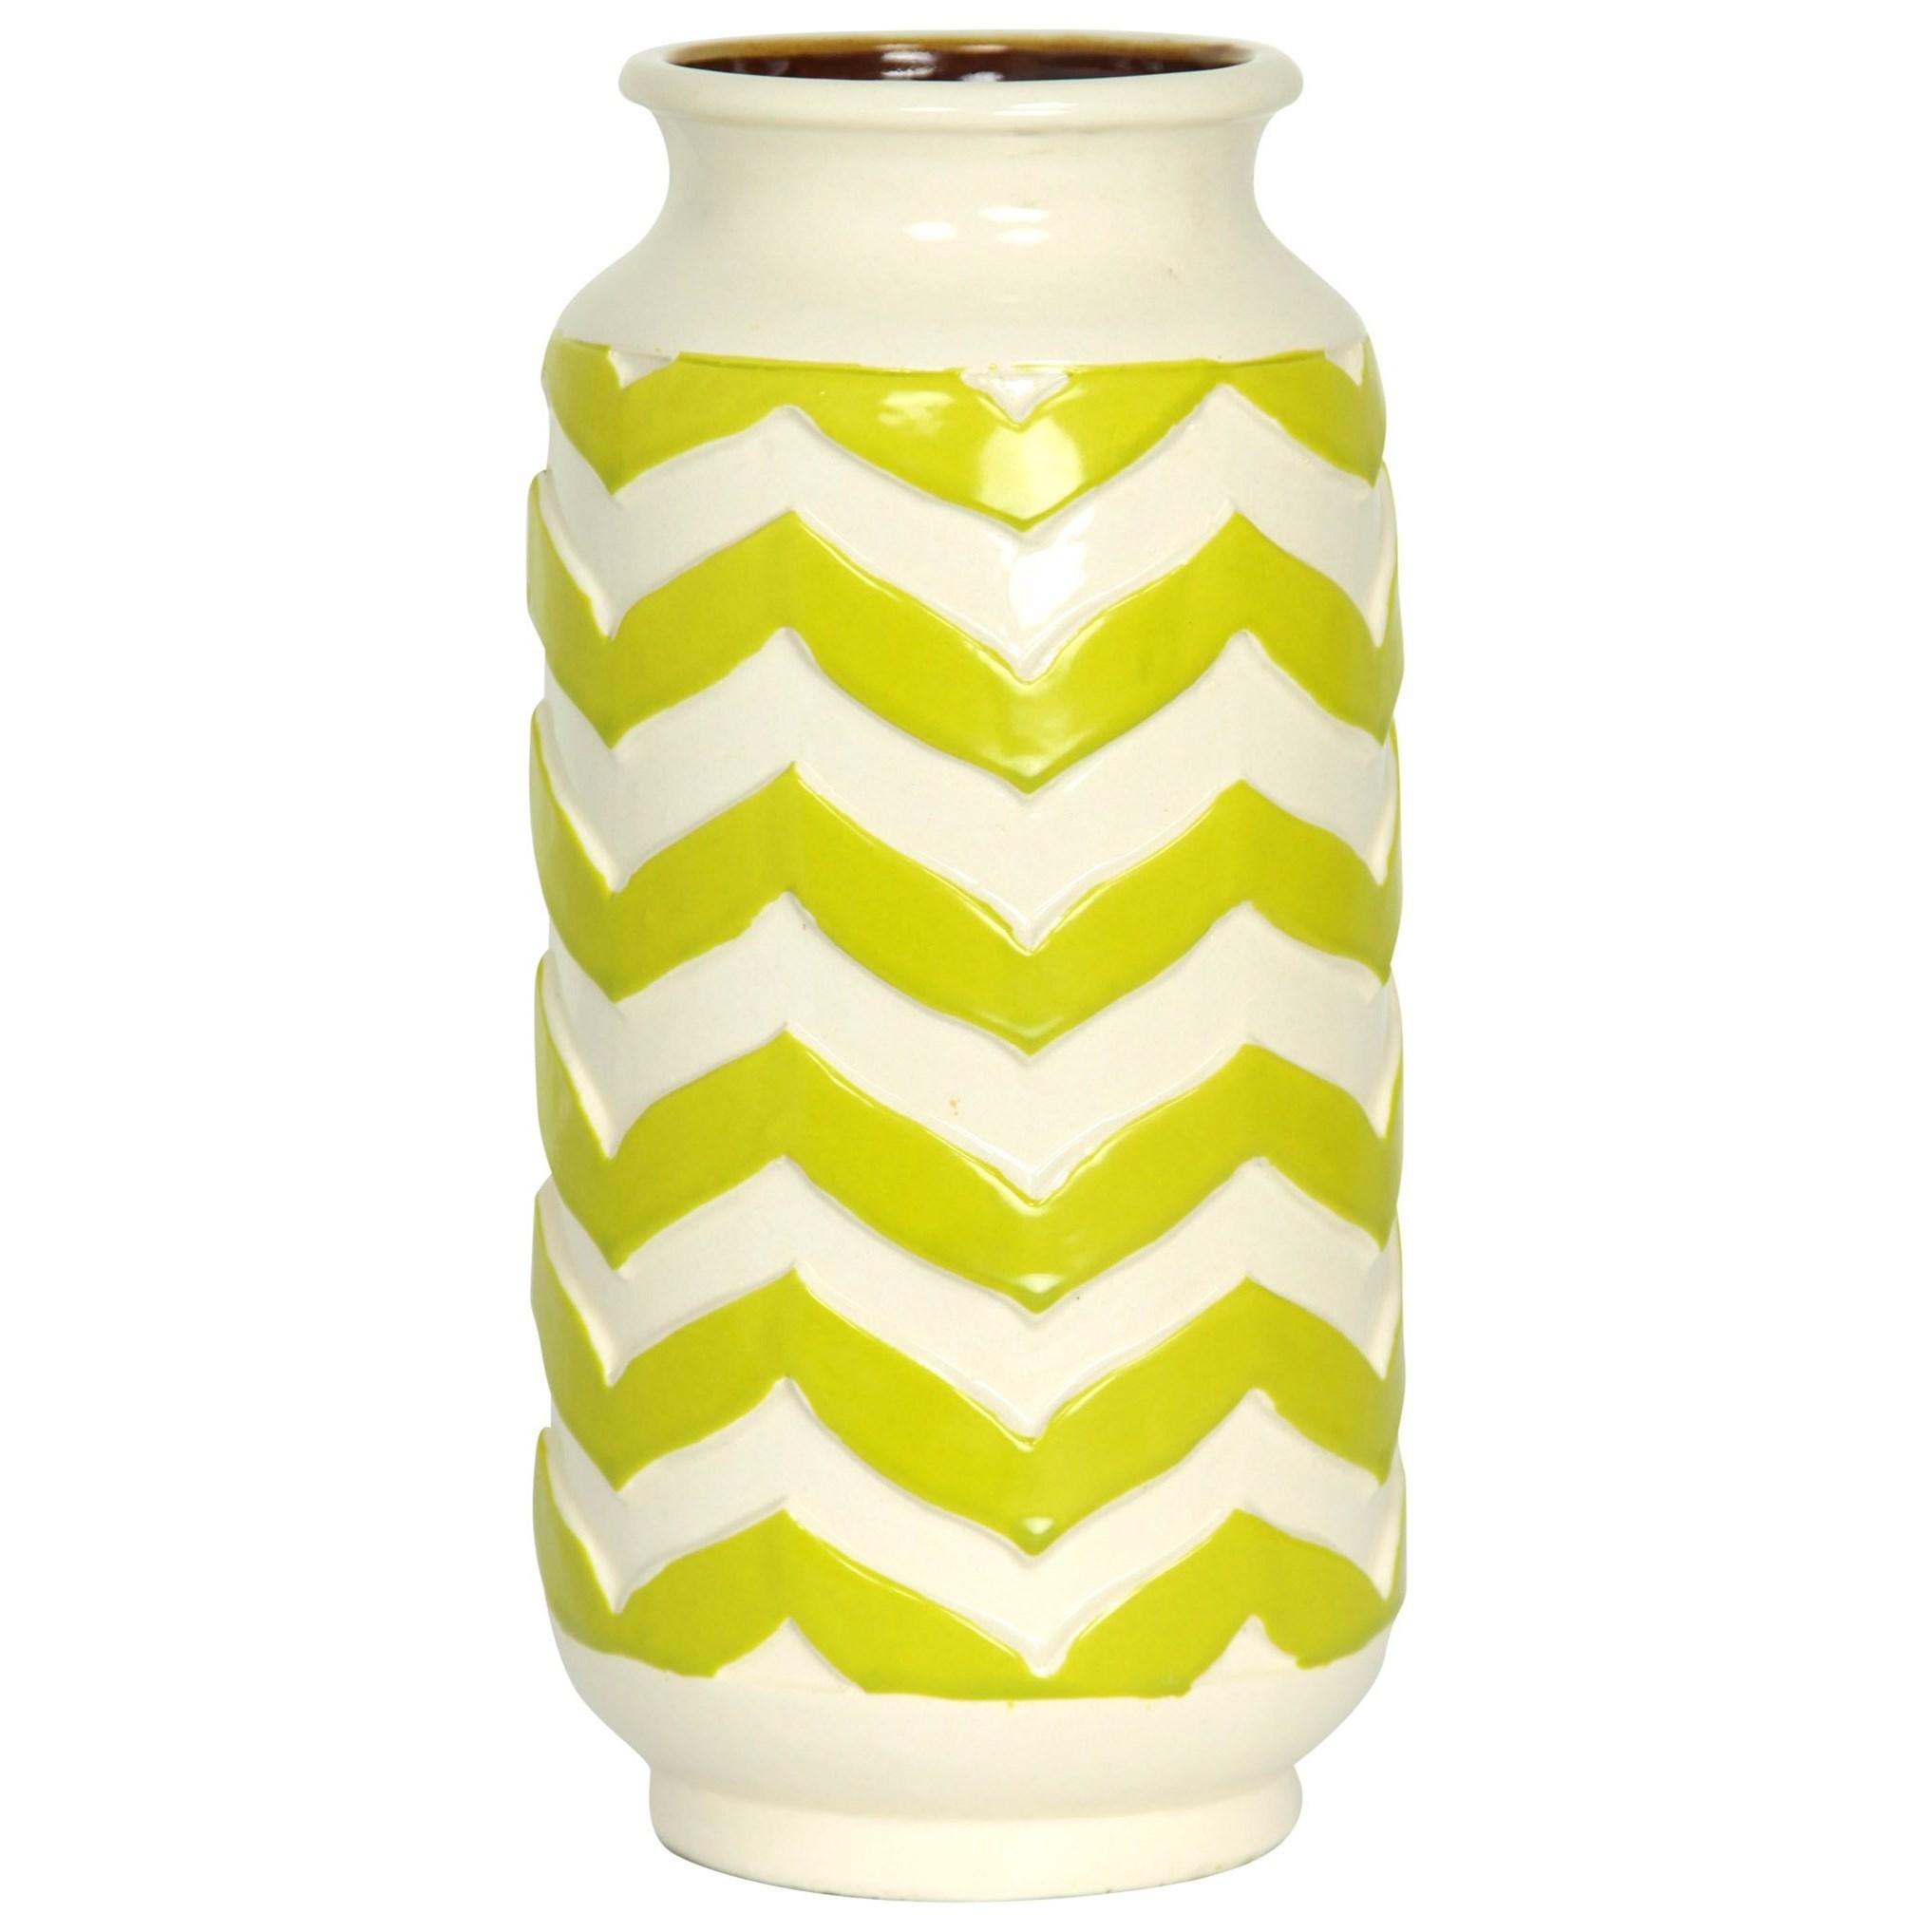 Accessories Chevron Striped Ceramic Vase by StyleCraft at Alison Craig Home Furnishings